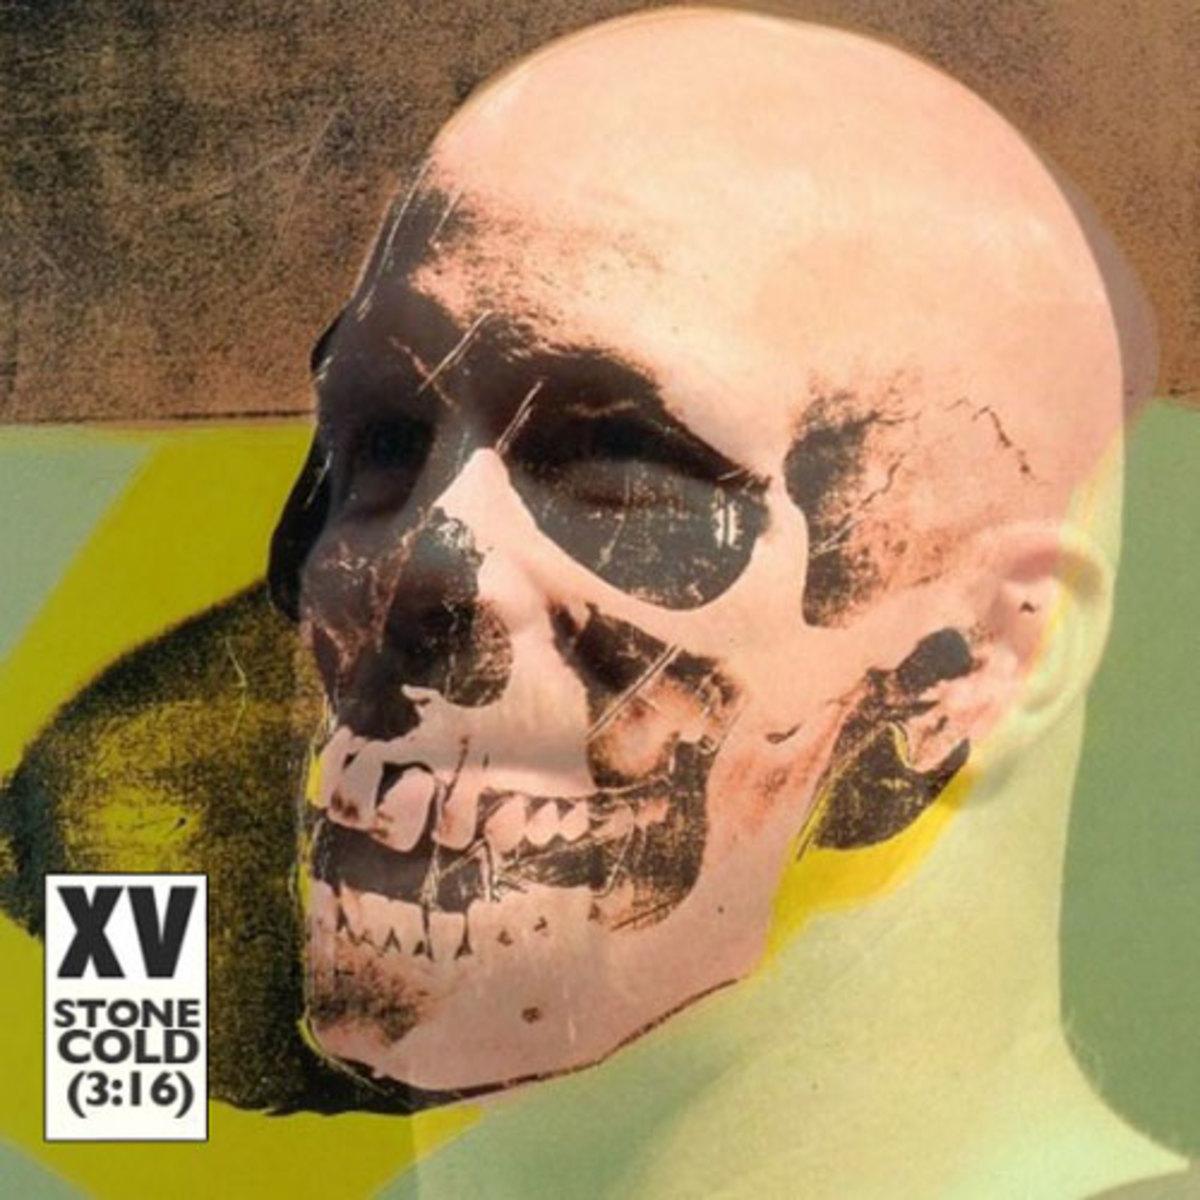 xv-stonecold.jpg